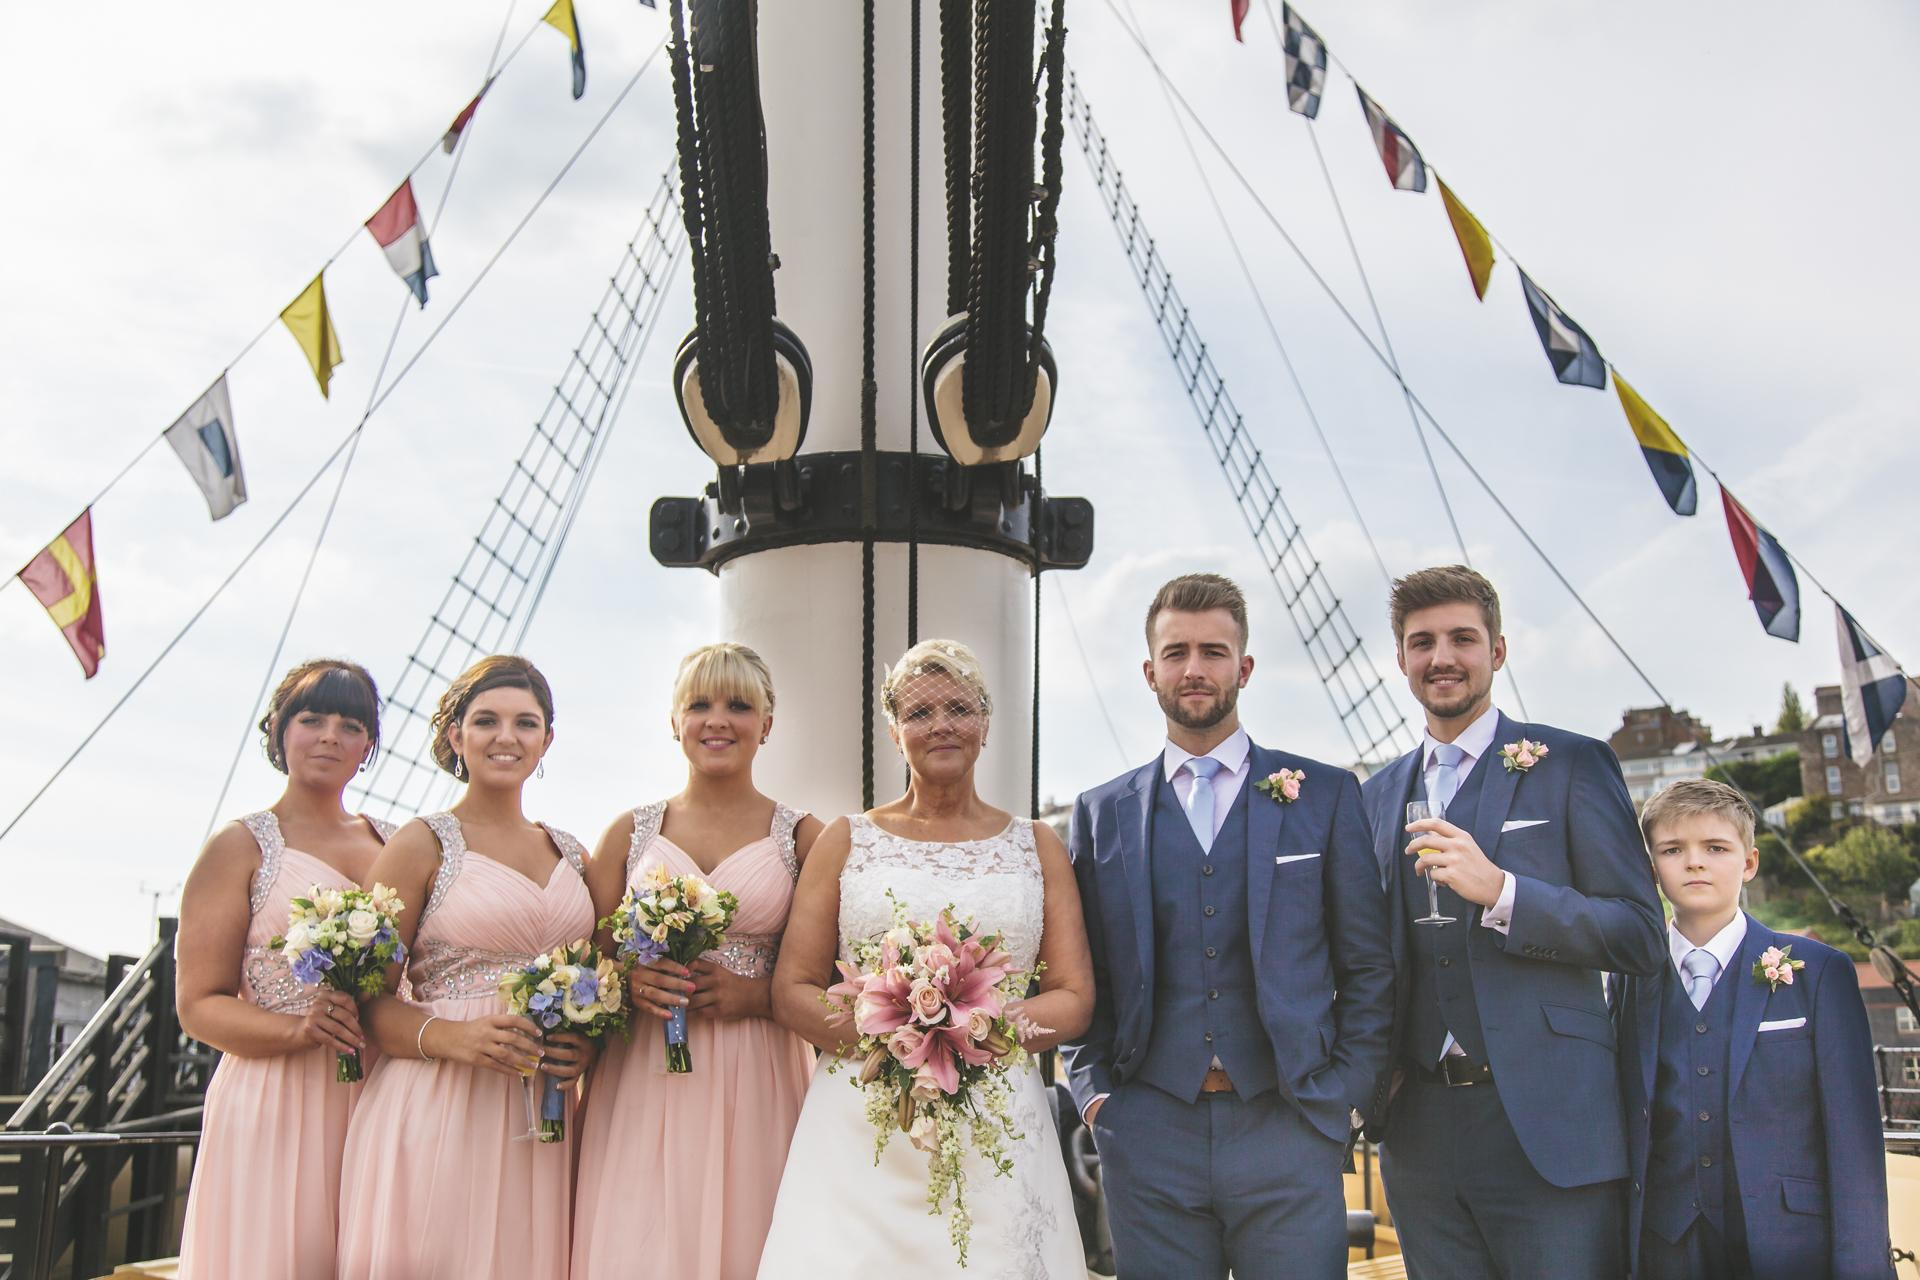 Wild pheasant wedding